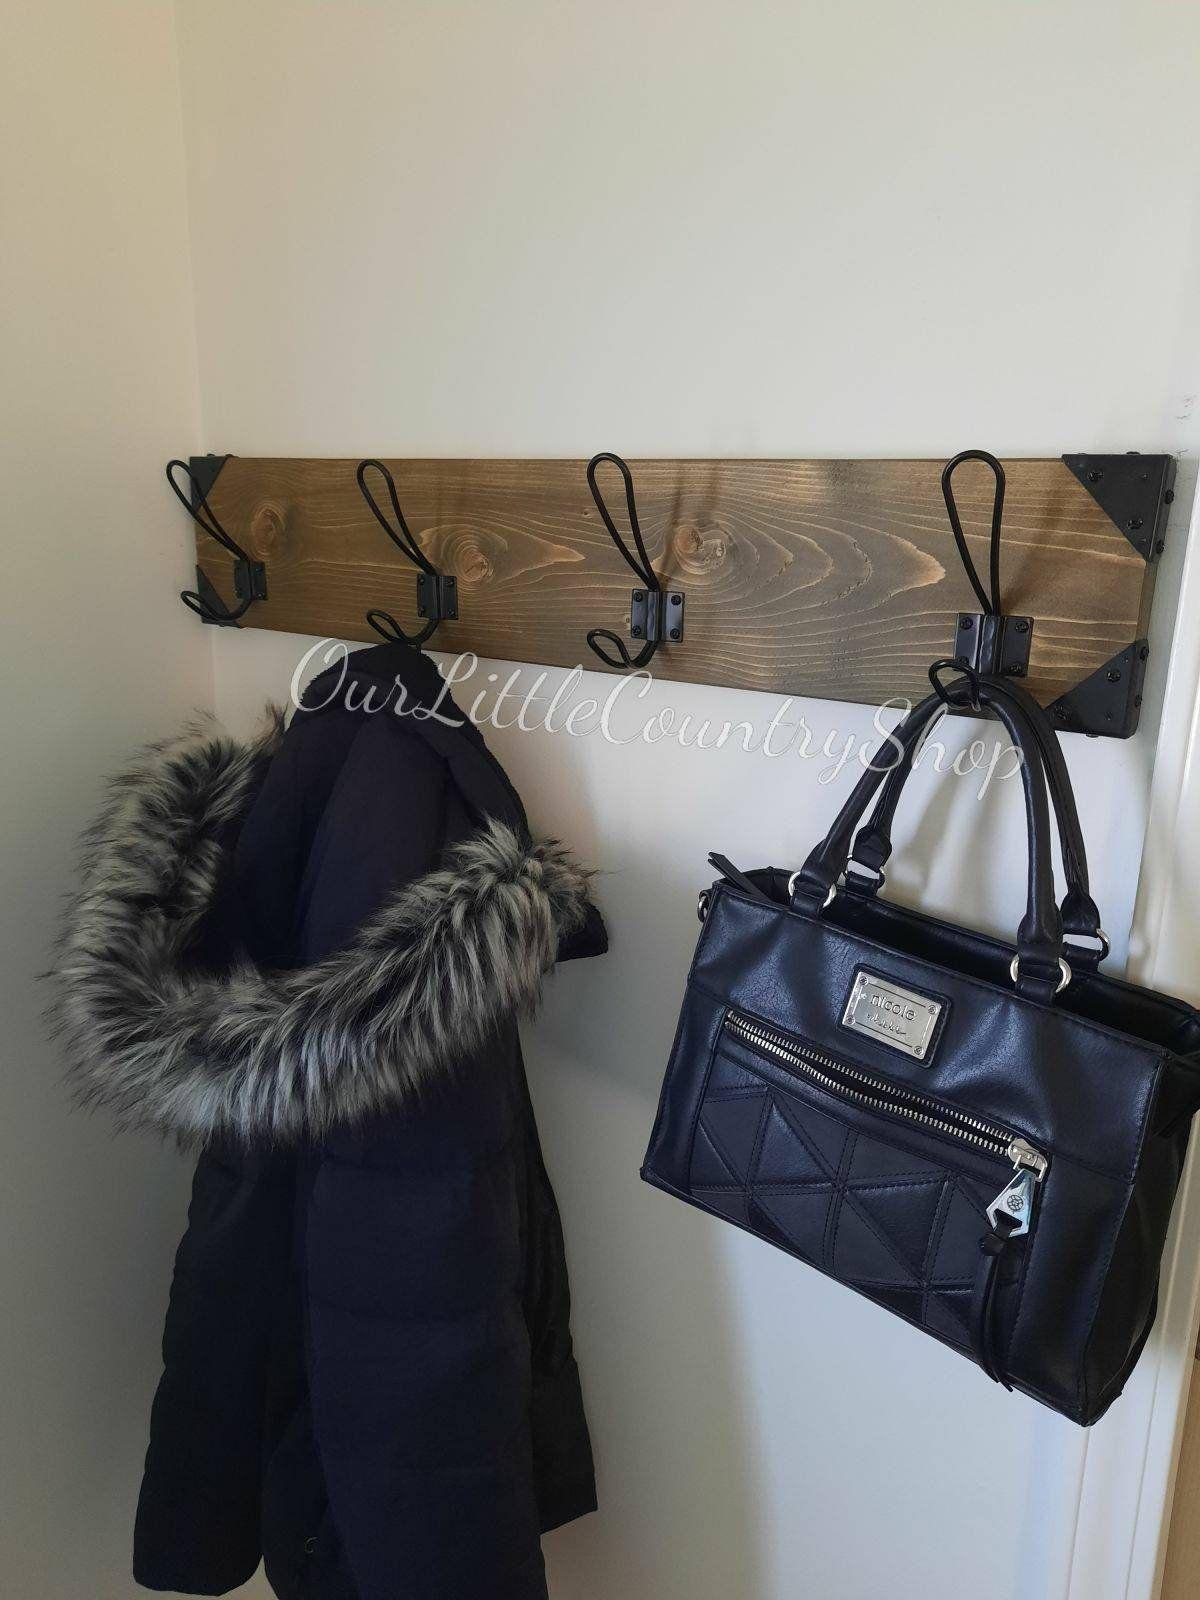 Farmhouse coat rack, Entryway coat rack, Bathroom towel hanger with hooks, Wall mount coat rack